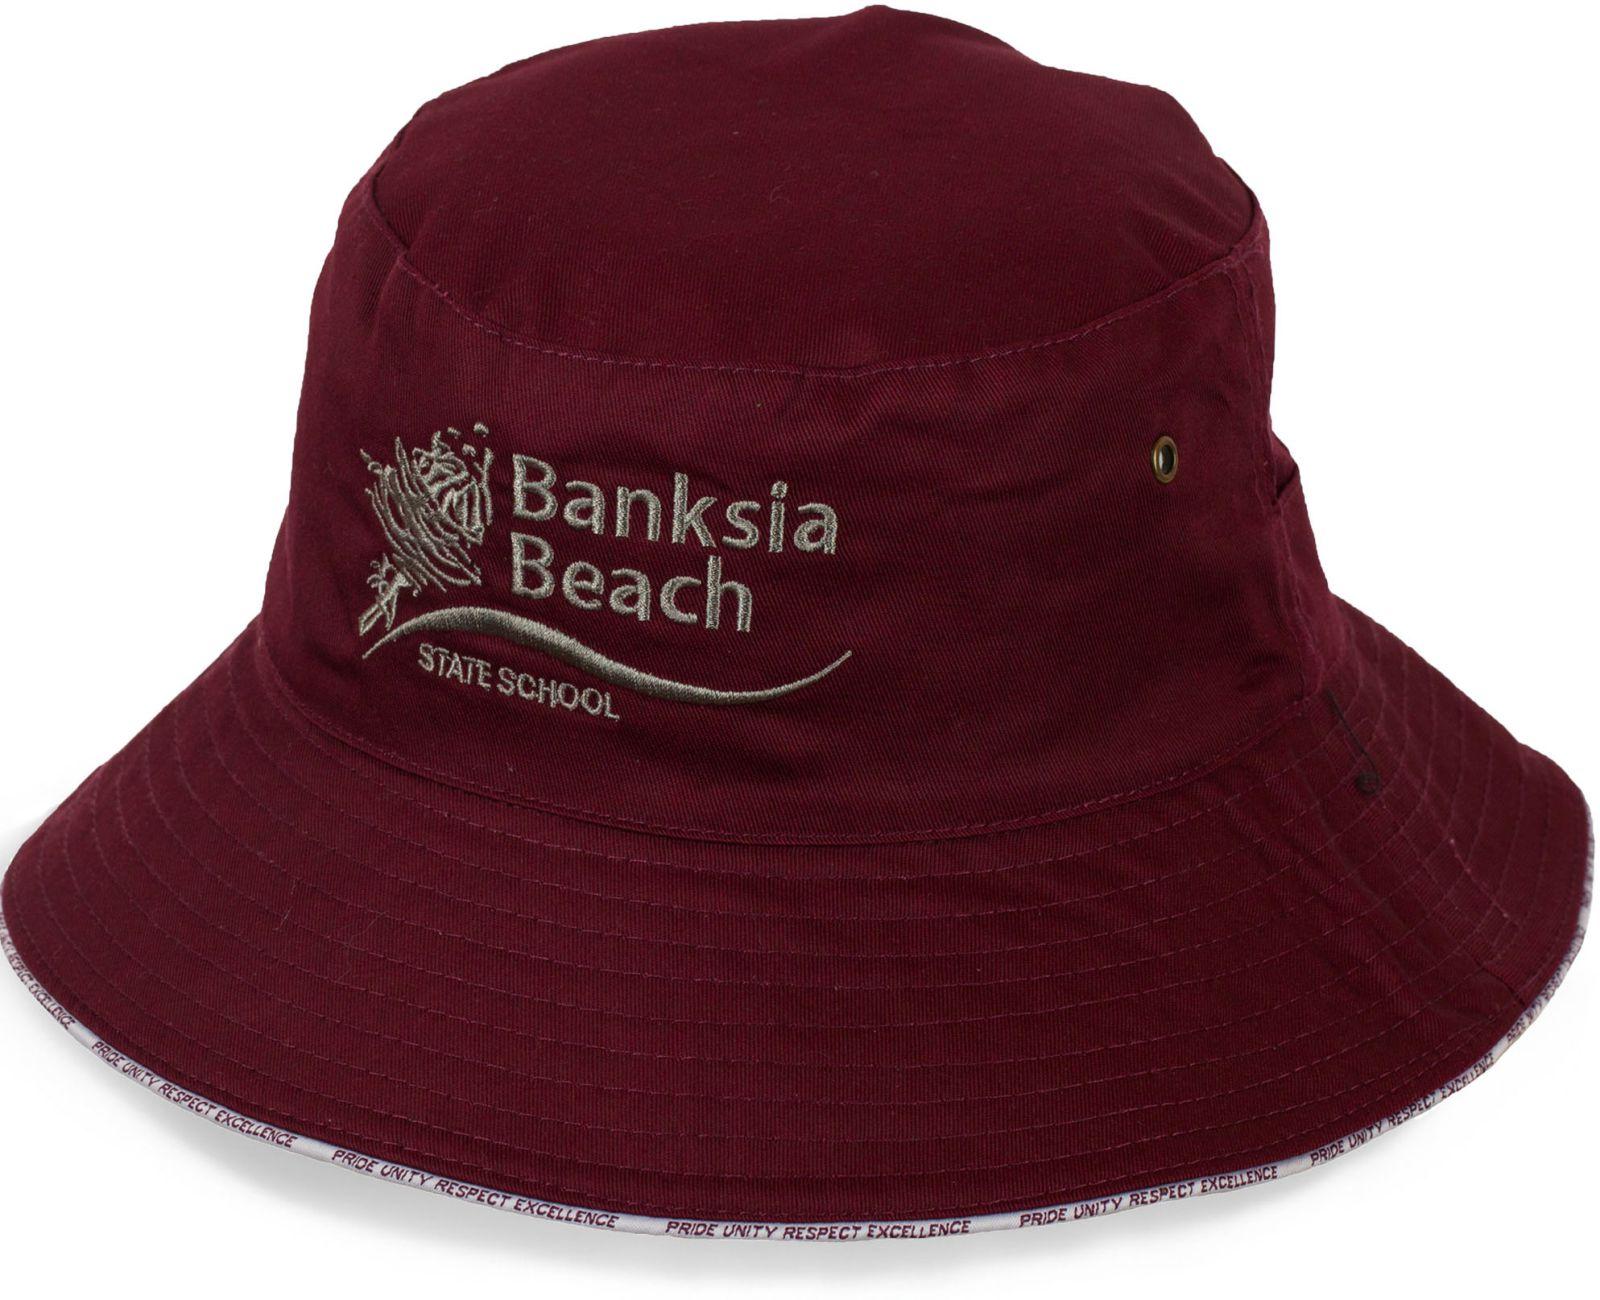 Пляжная панама для незабываемых впечатлений